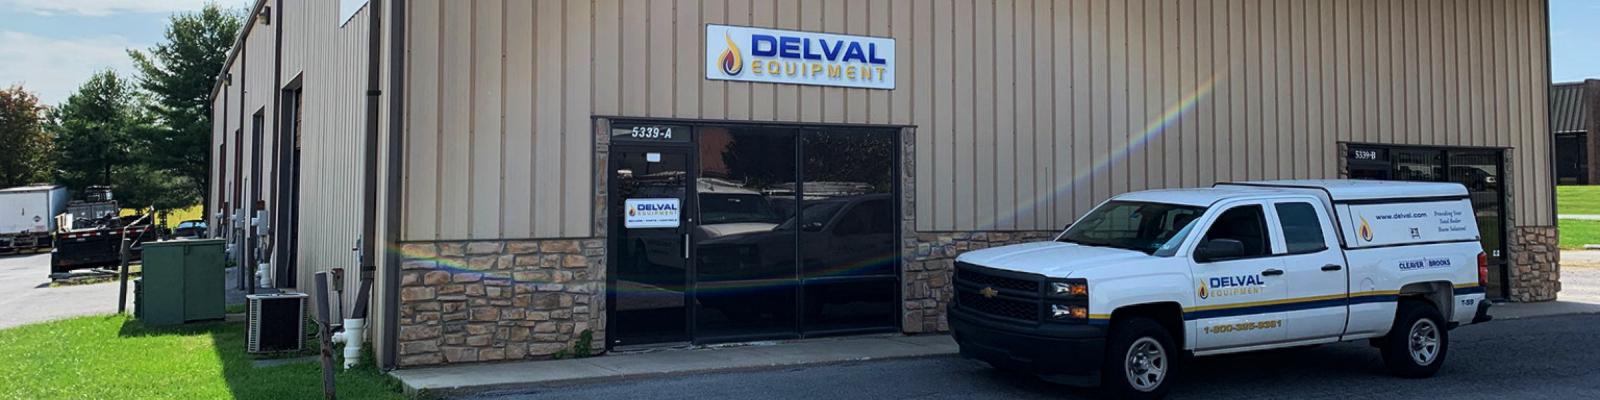 Delval Equipment Boiler Parts